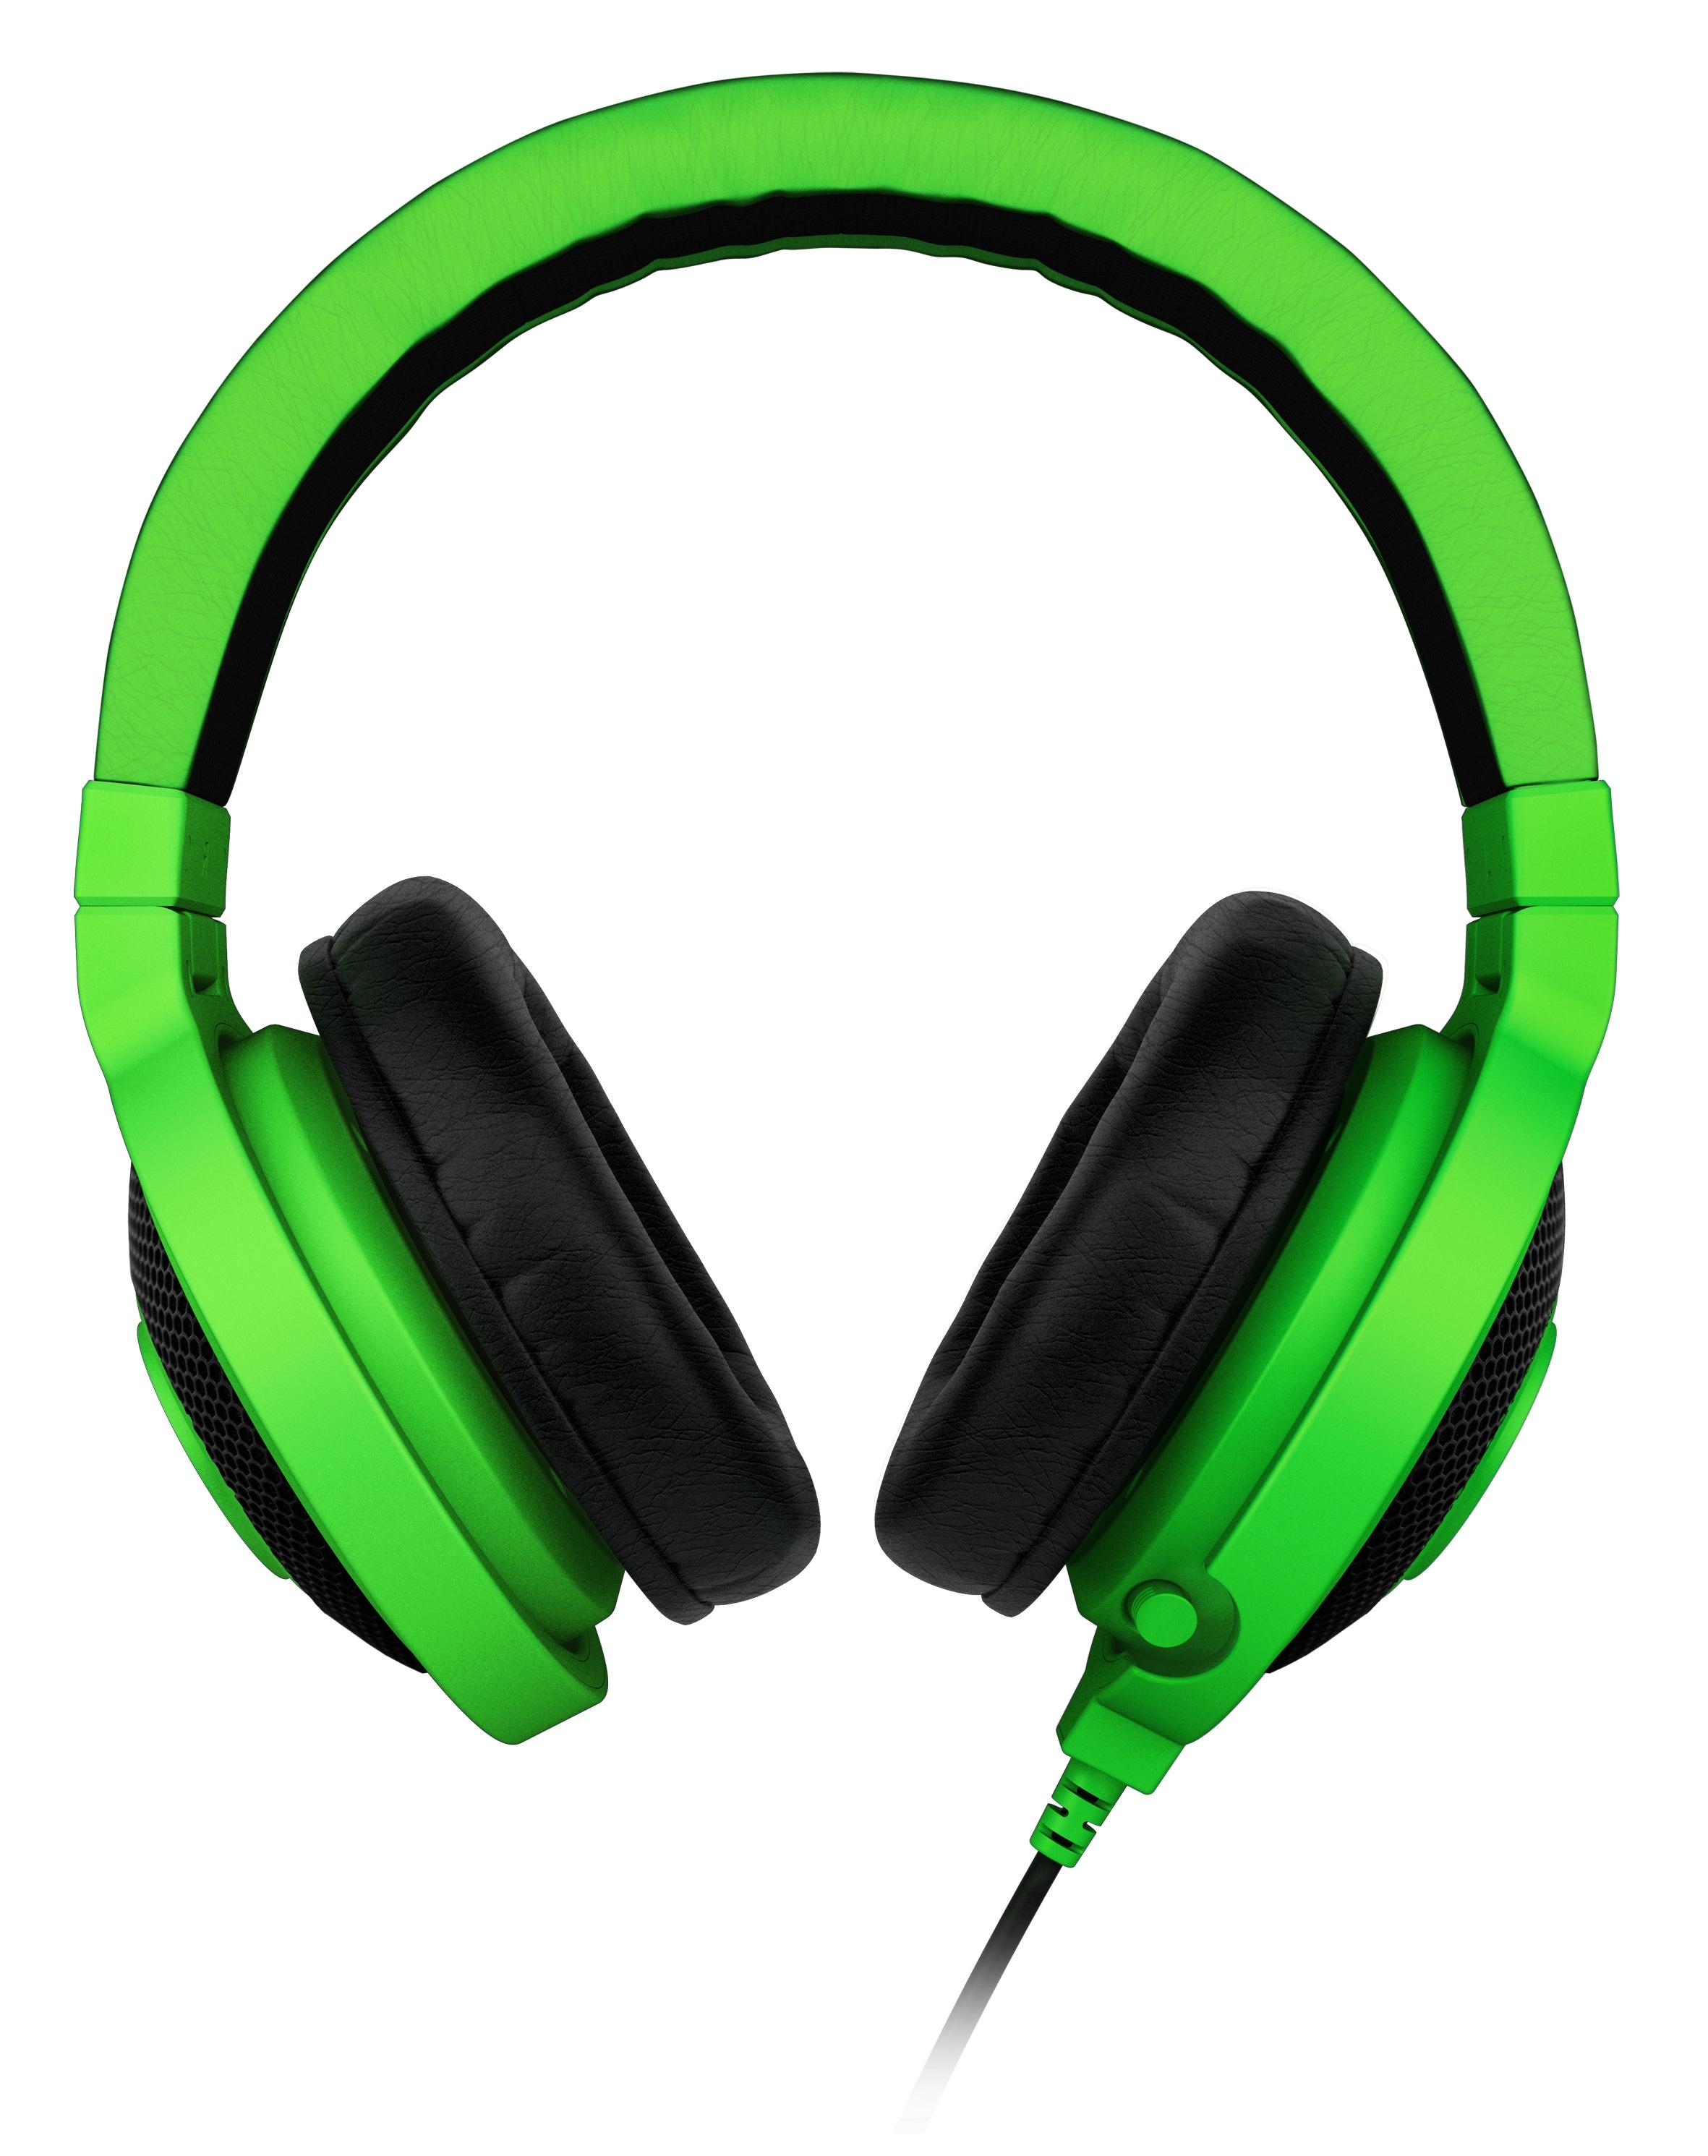 Razer Unveils The Kraken Pro Gaming Headset Game Longer